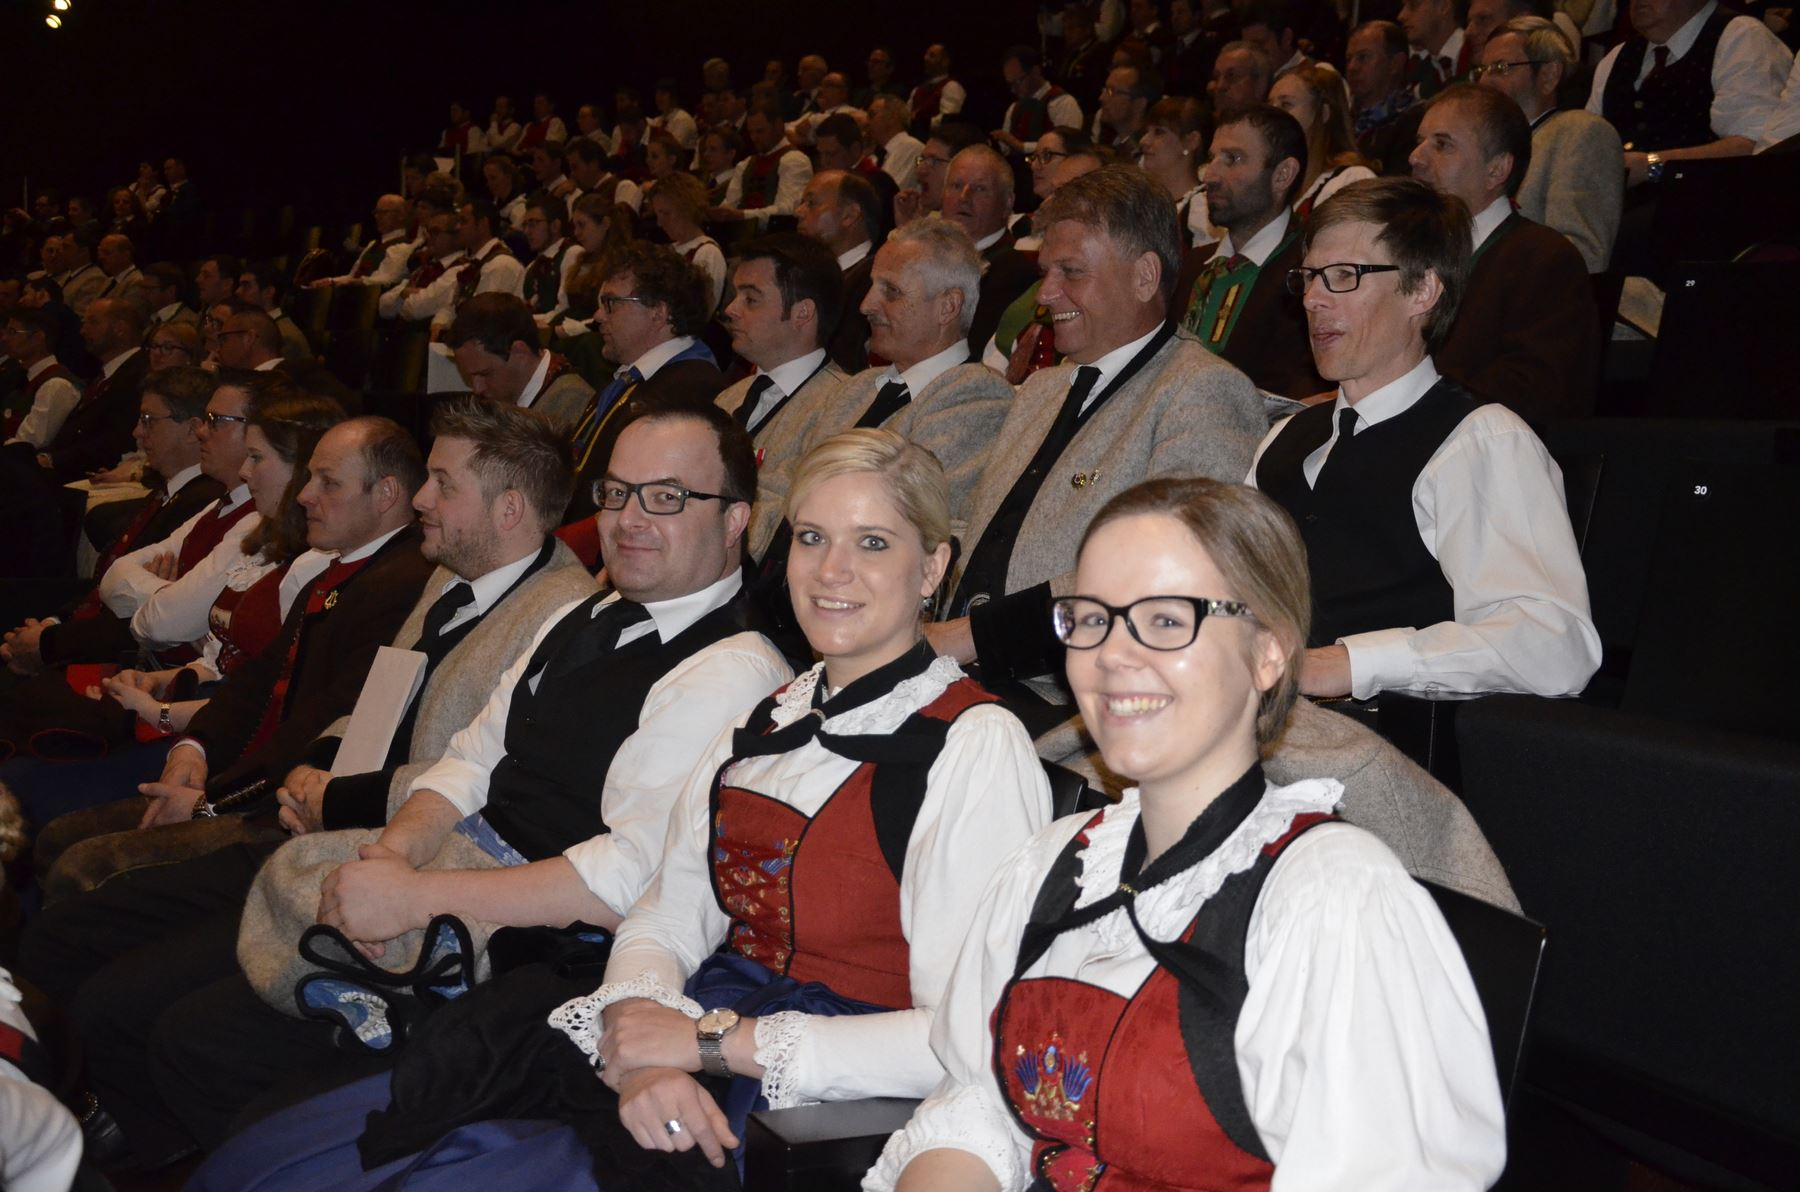 2017-03-12 Landesverbandsitzung Erl 014